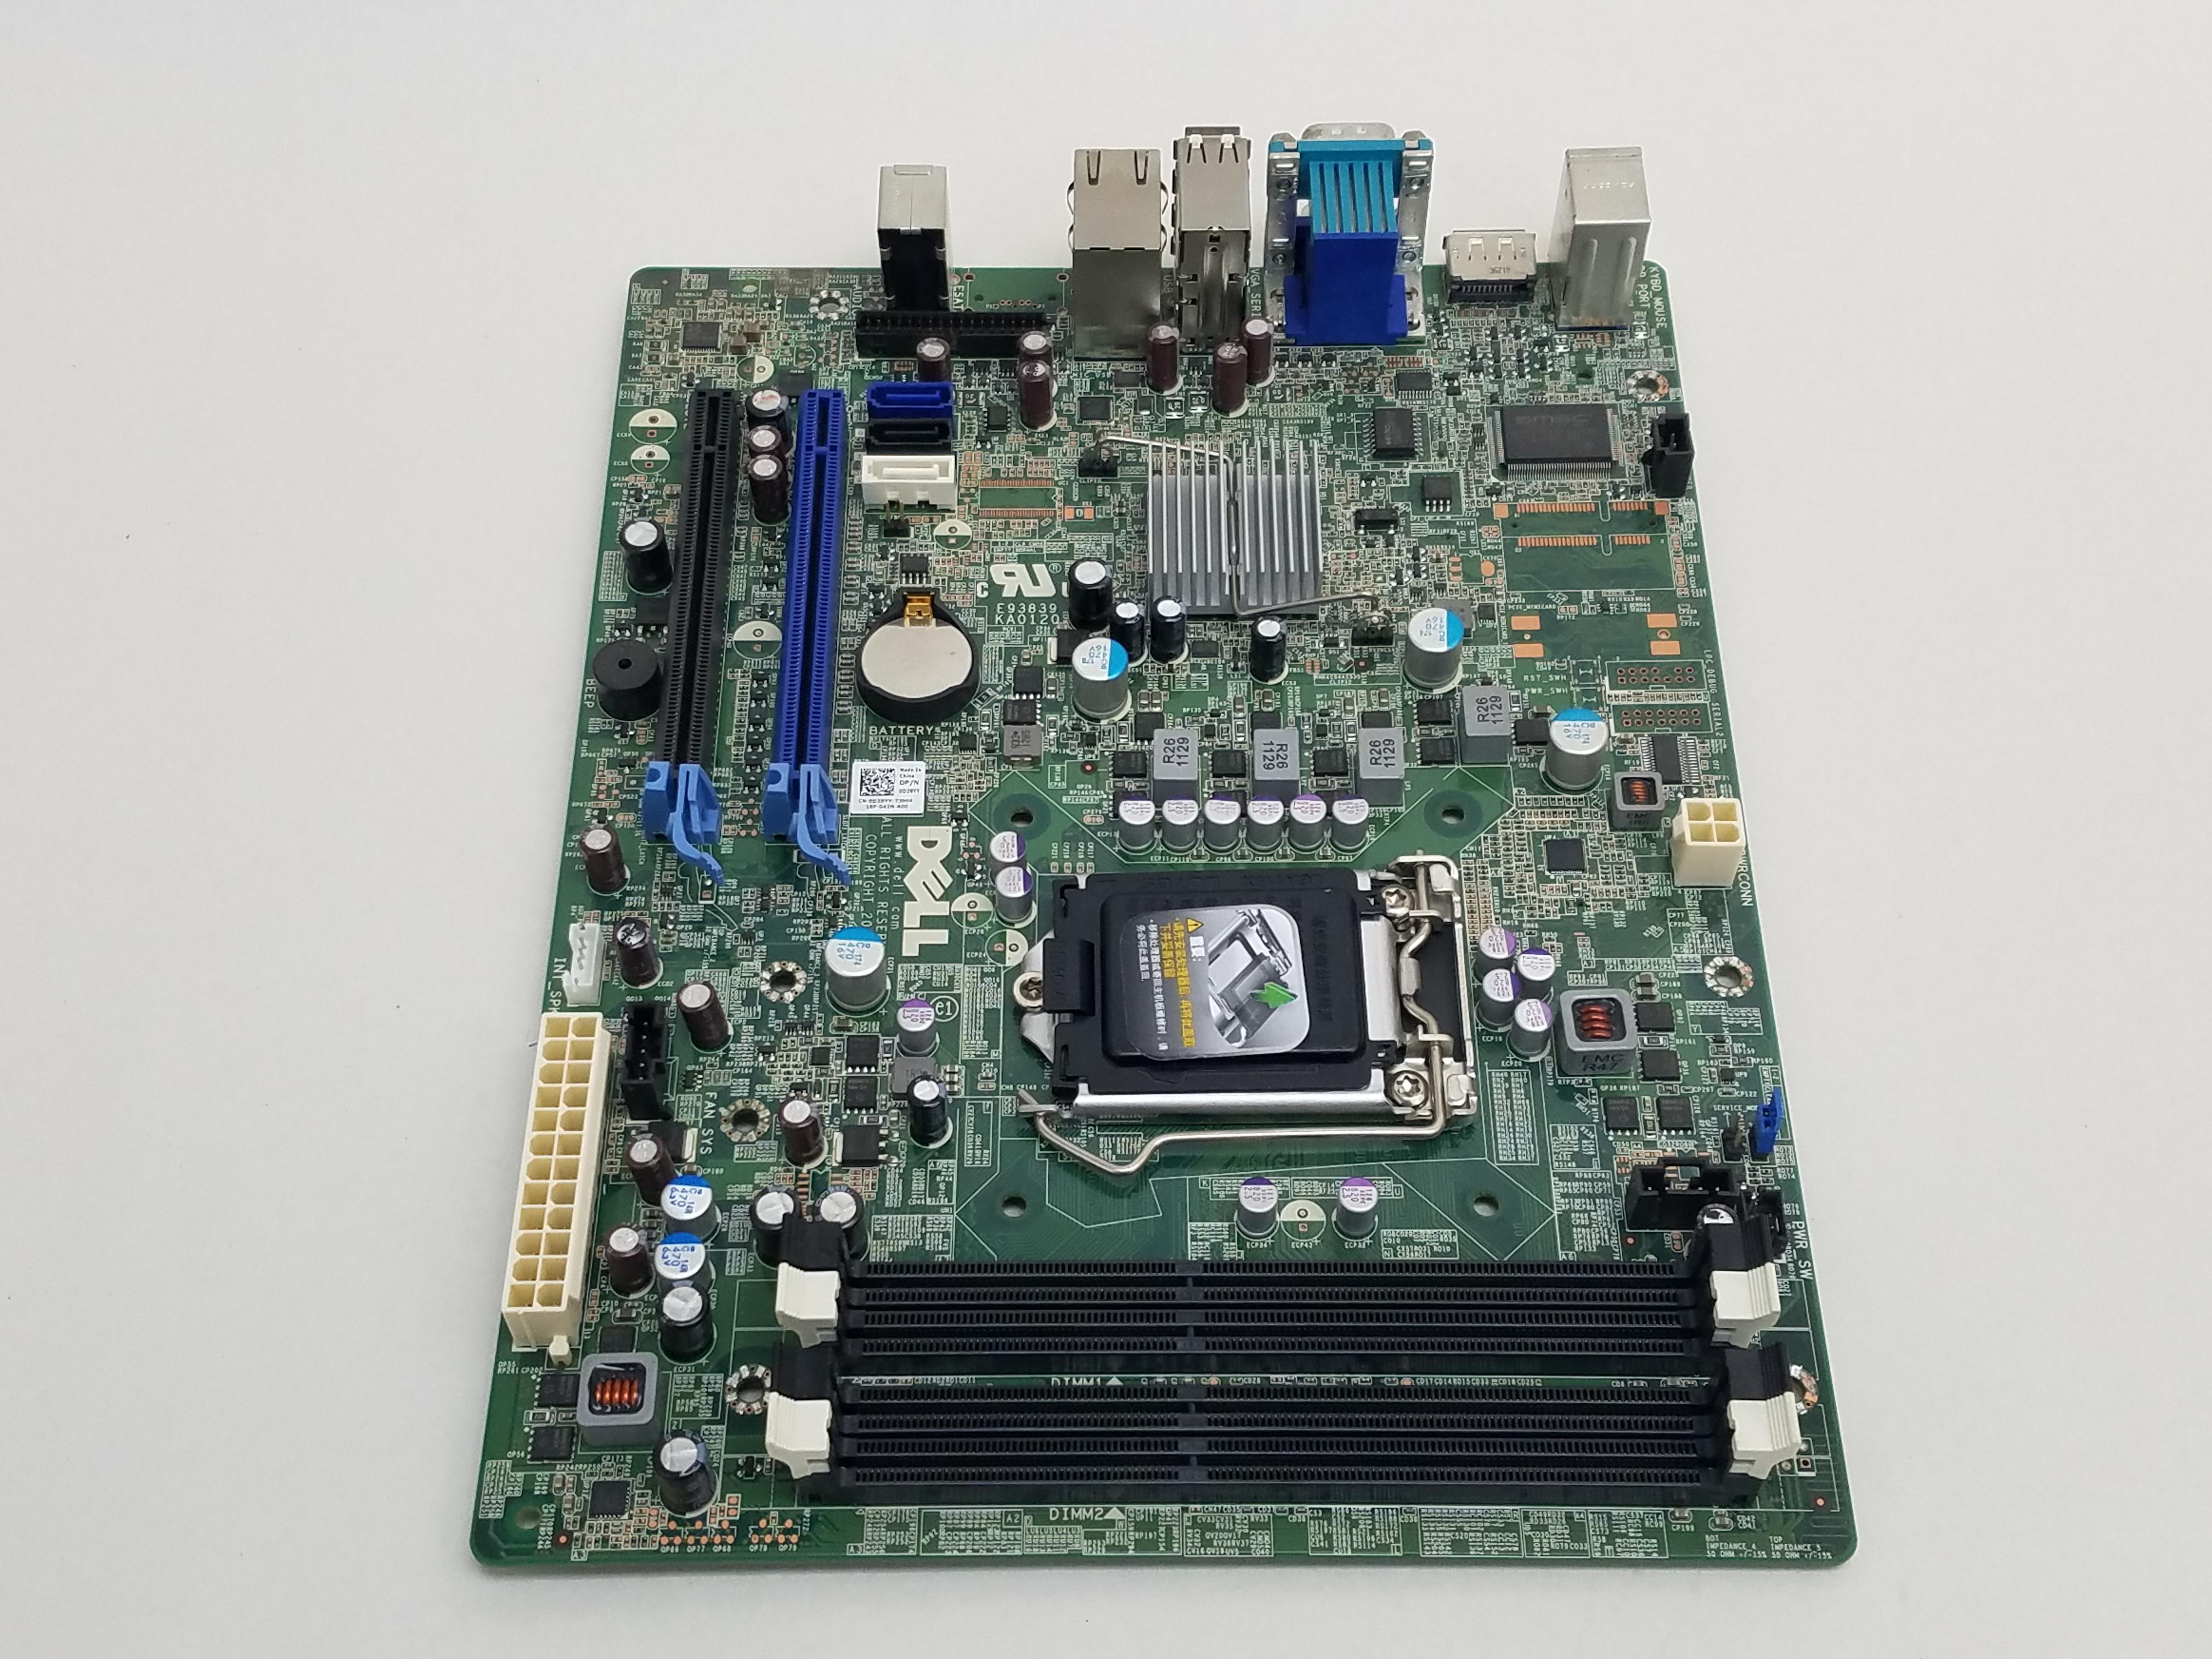 D28YY DELL OPTIPLEX 790 SFF LGA 1155 MOTHERBOARD TESTED L@@K